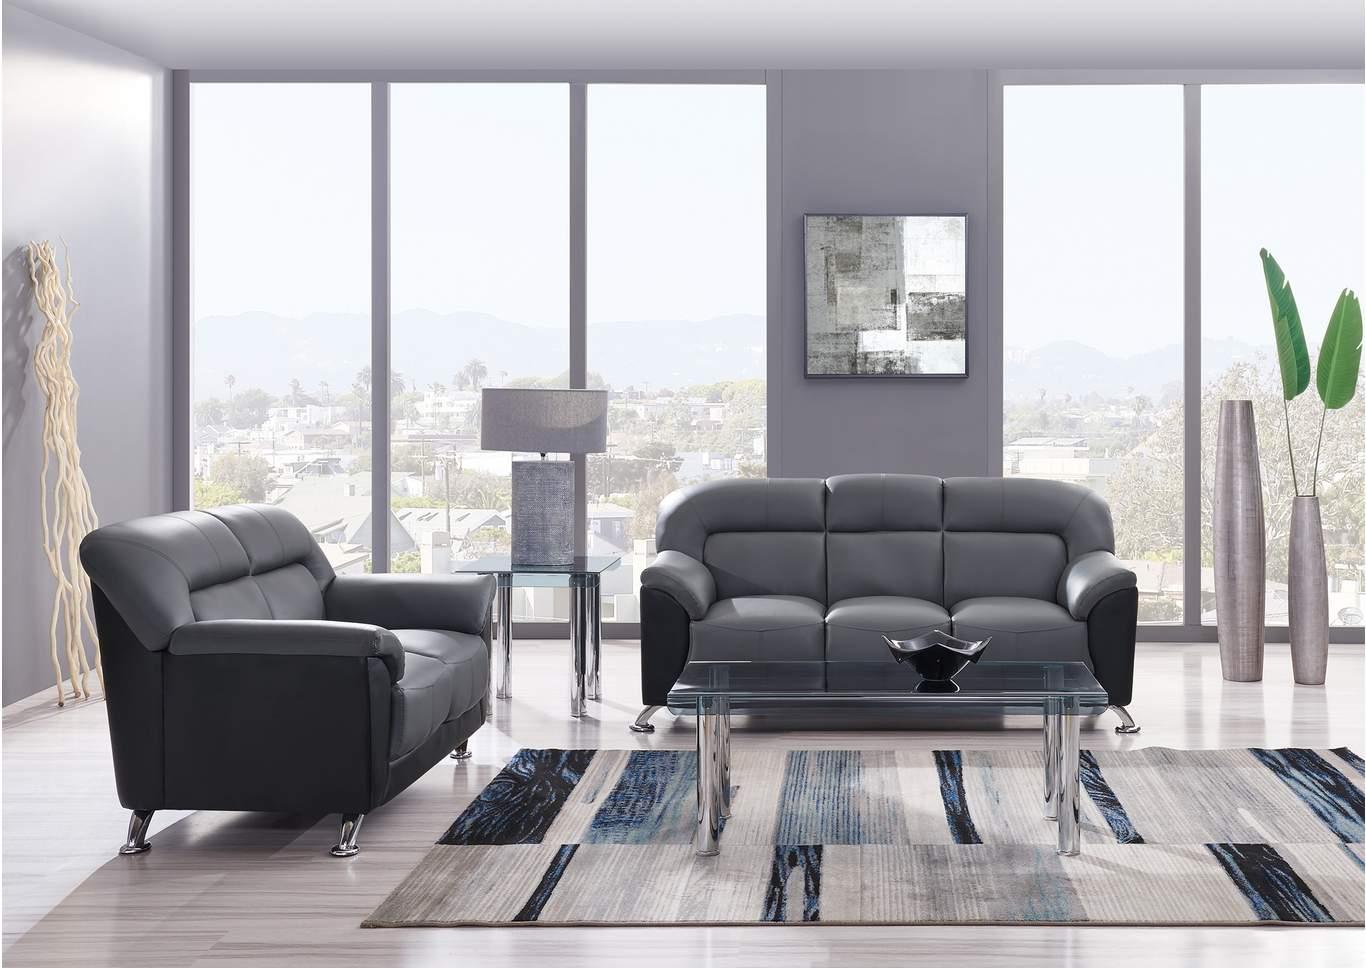 Excellent Sell A Cow Furniture Il Dark Grey Black Sofa Loveseat Machost Co Dining Chair Design Ideas Machostcouk